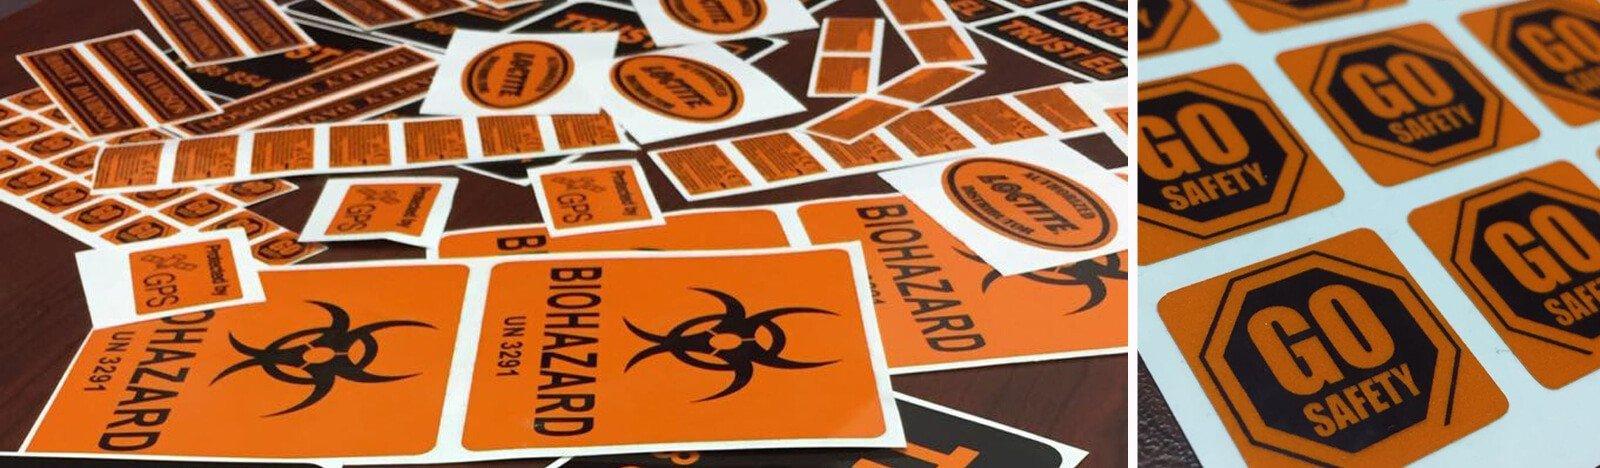 Orange reflective vinyl labels printing